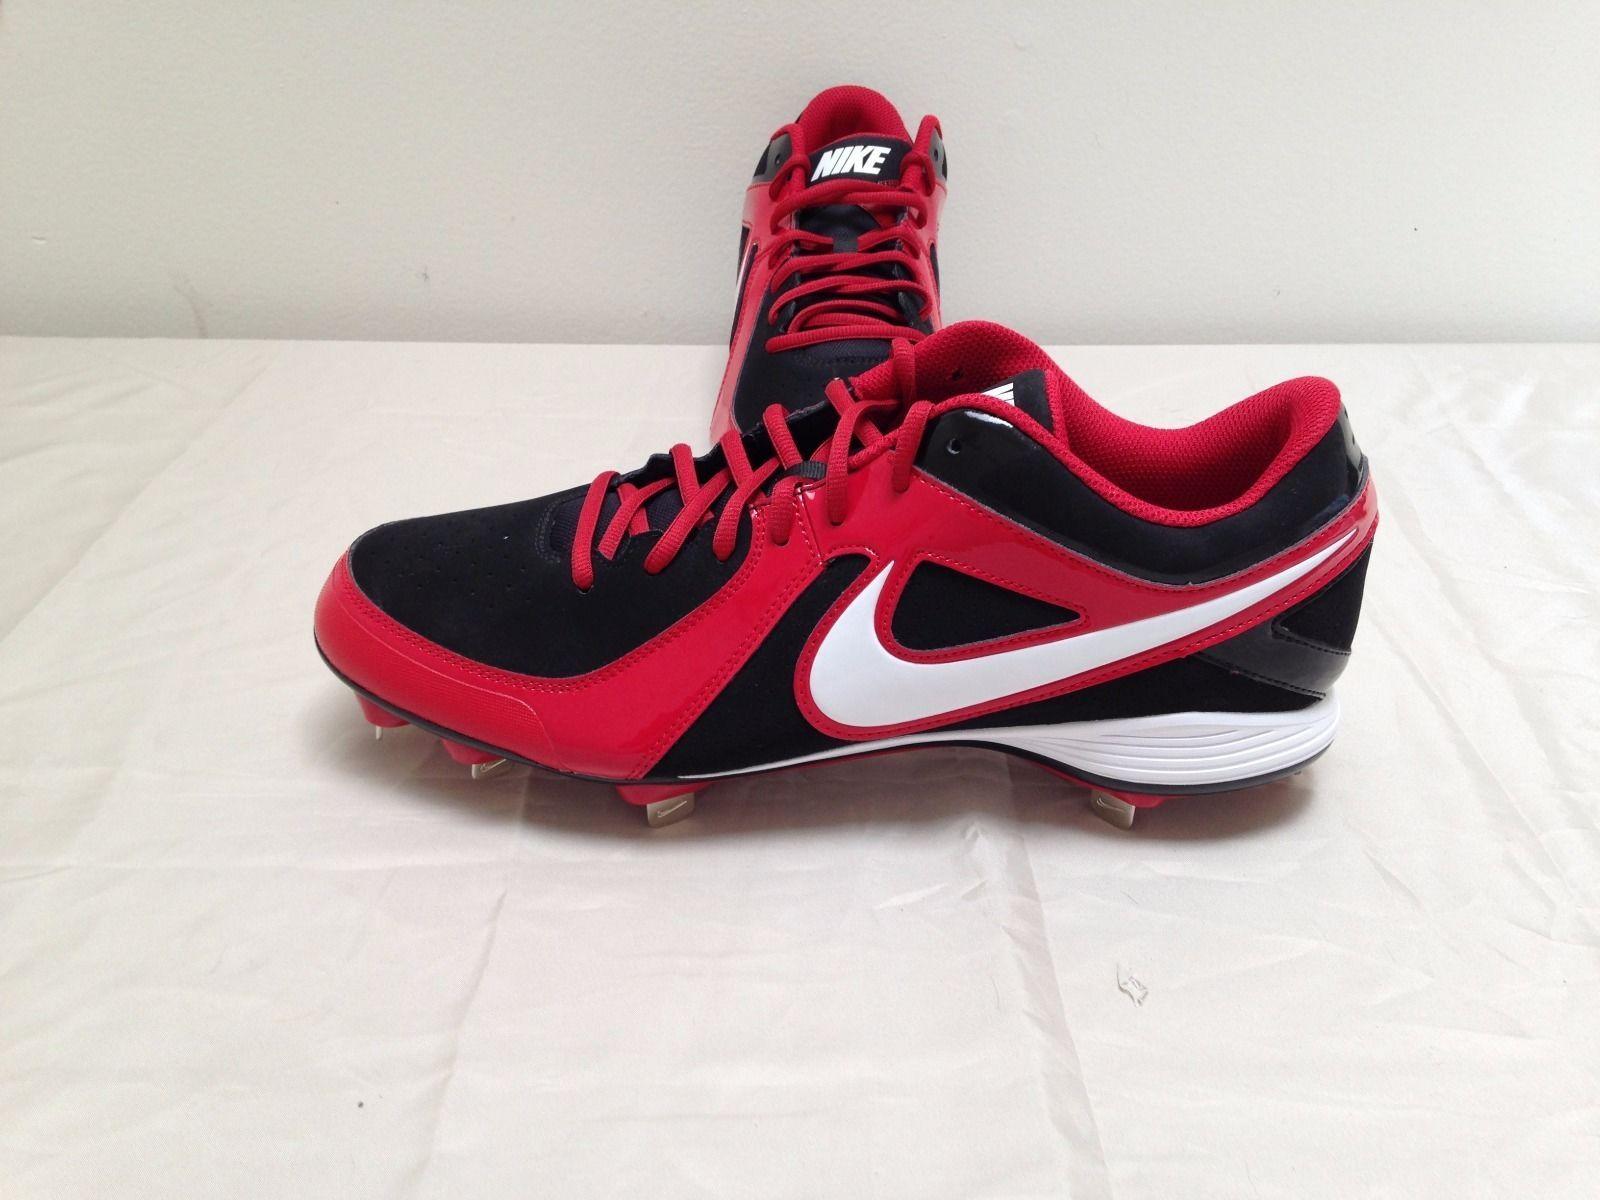 Metal Baseball Cleats Nike 50 Mvp Huelga Baja Y 50 Nike Artículos Similares e752fb